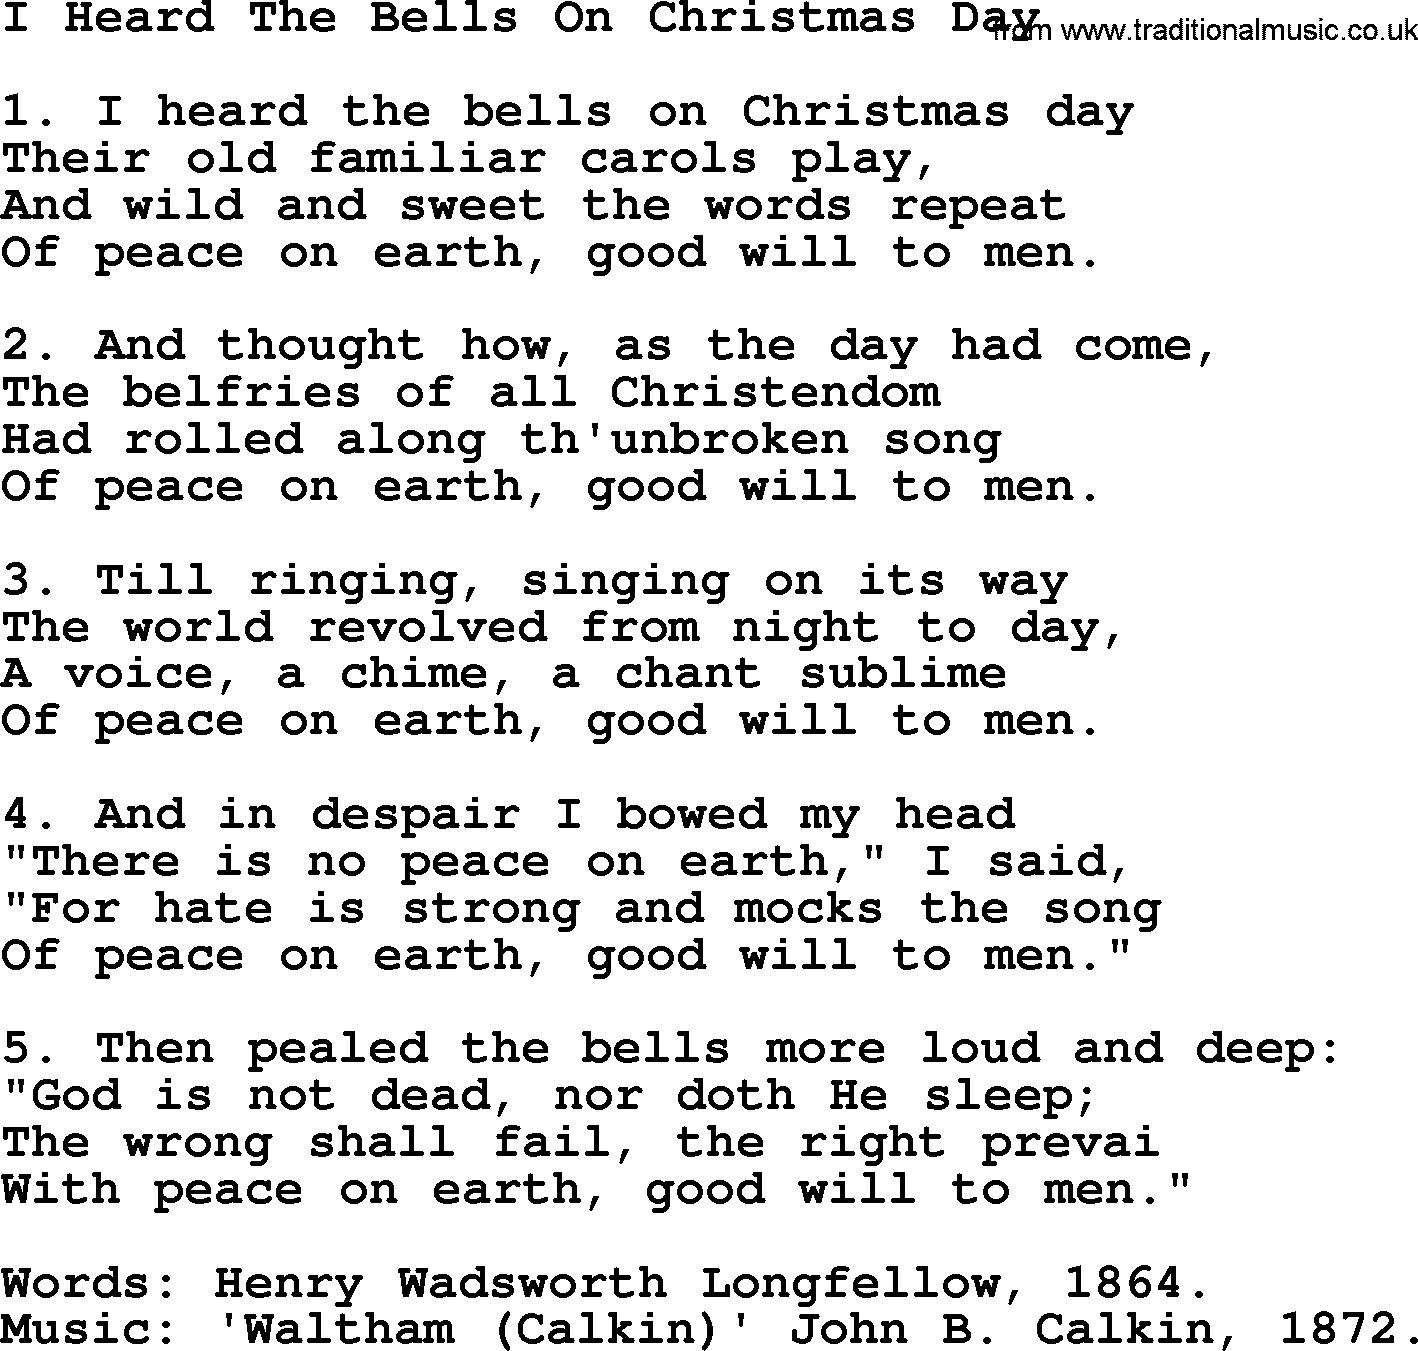 i heard the bells chords - I Heard The Bells On Christmas Day Chords